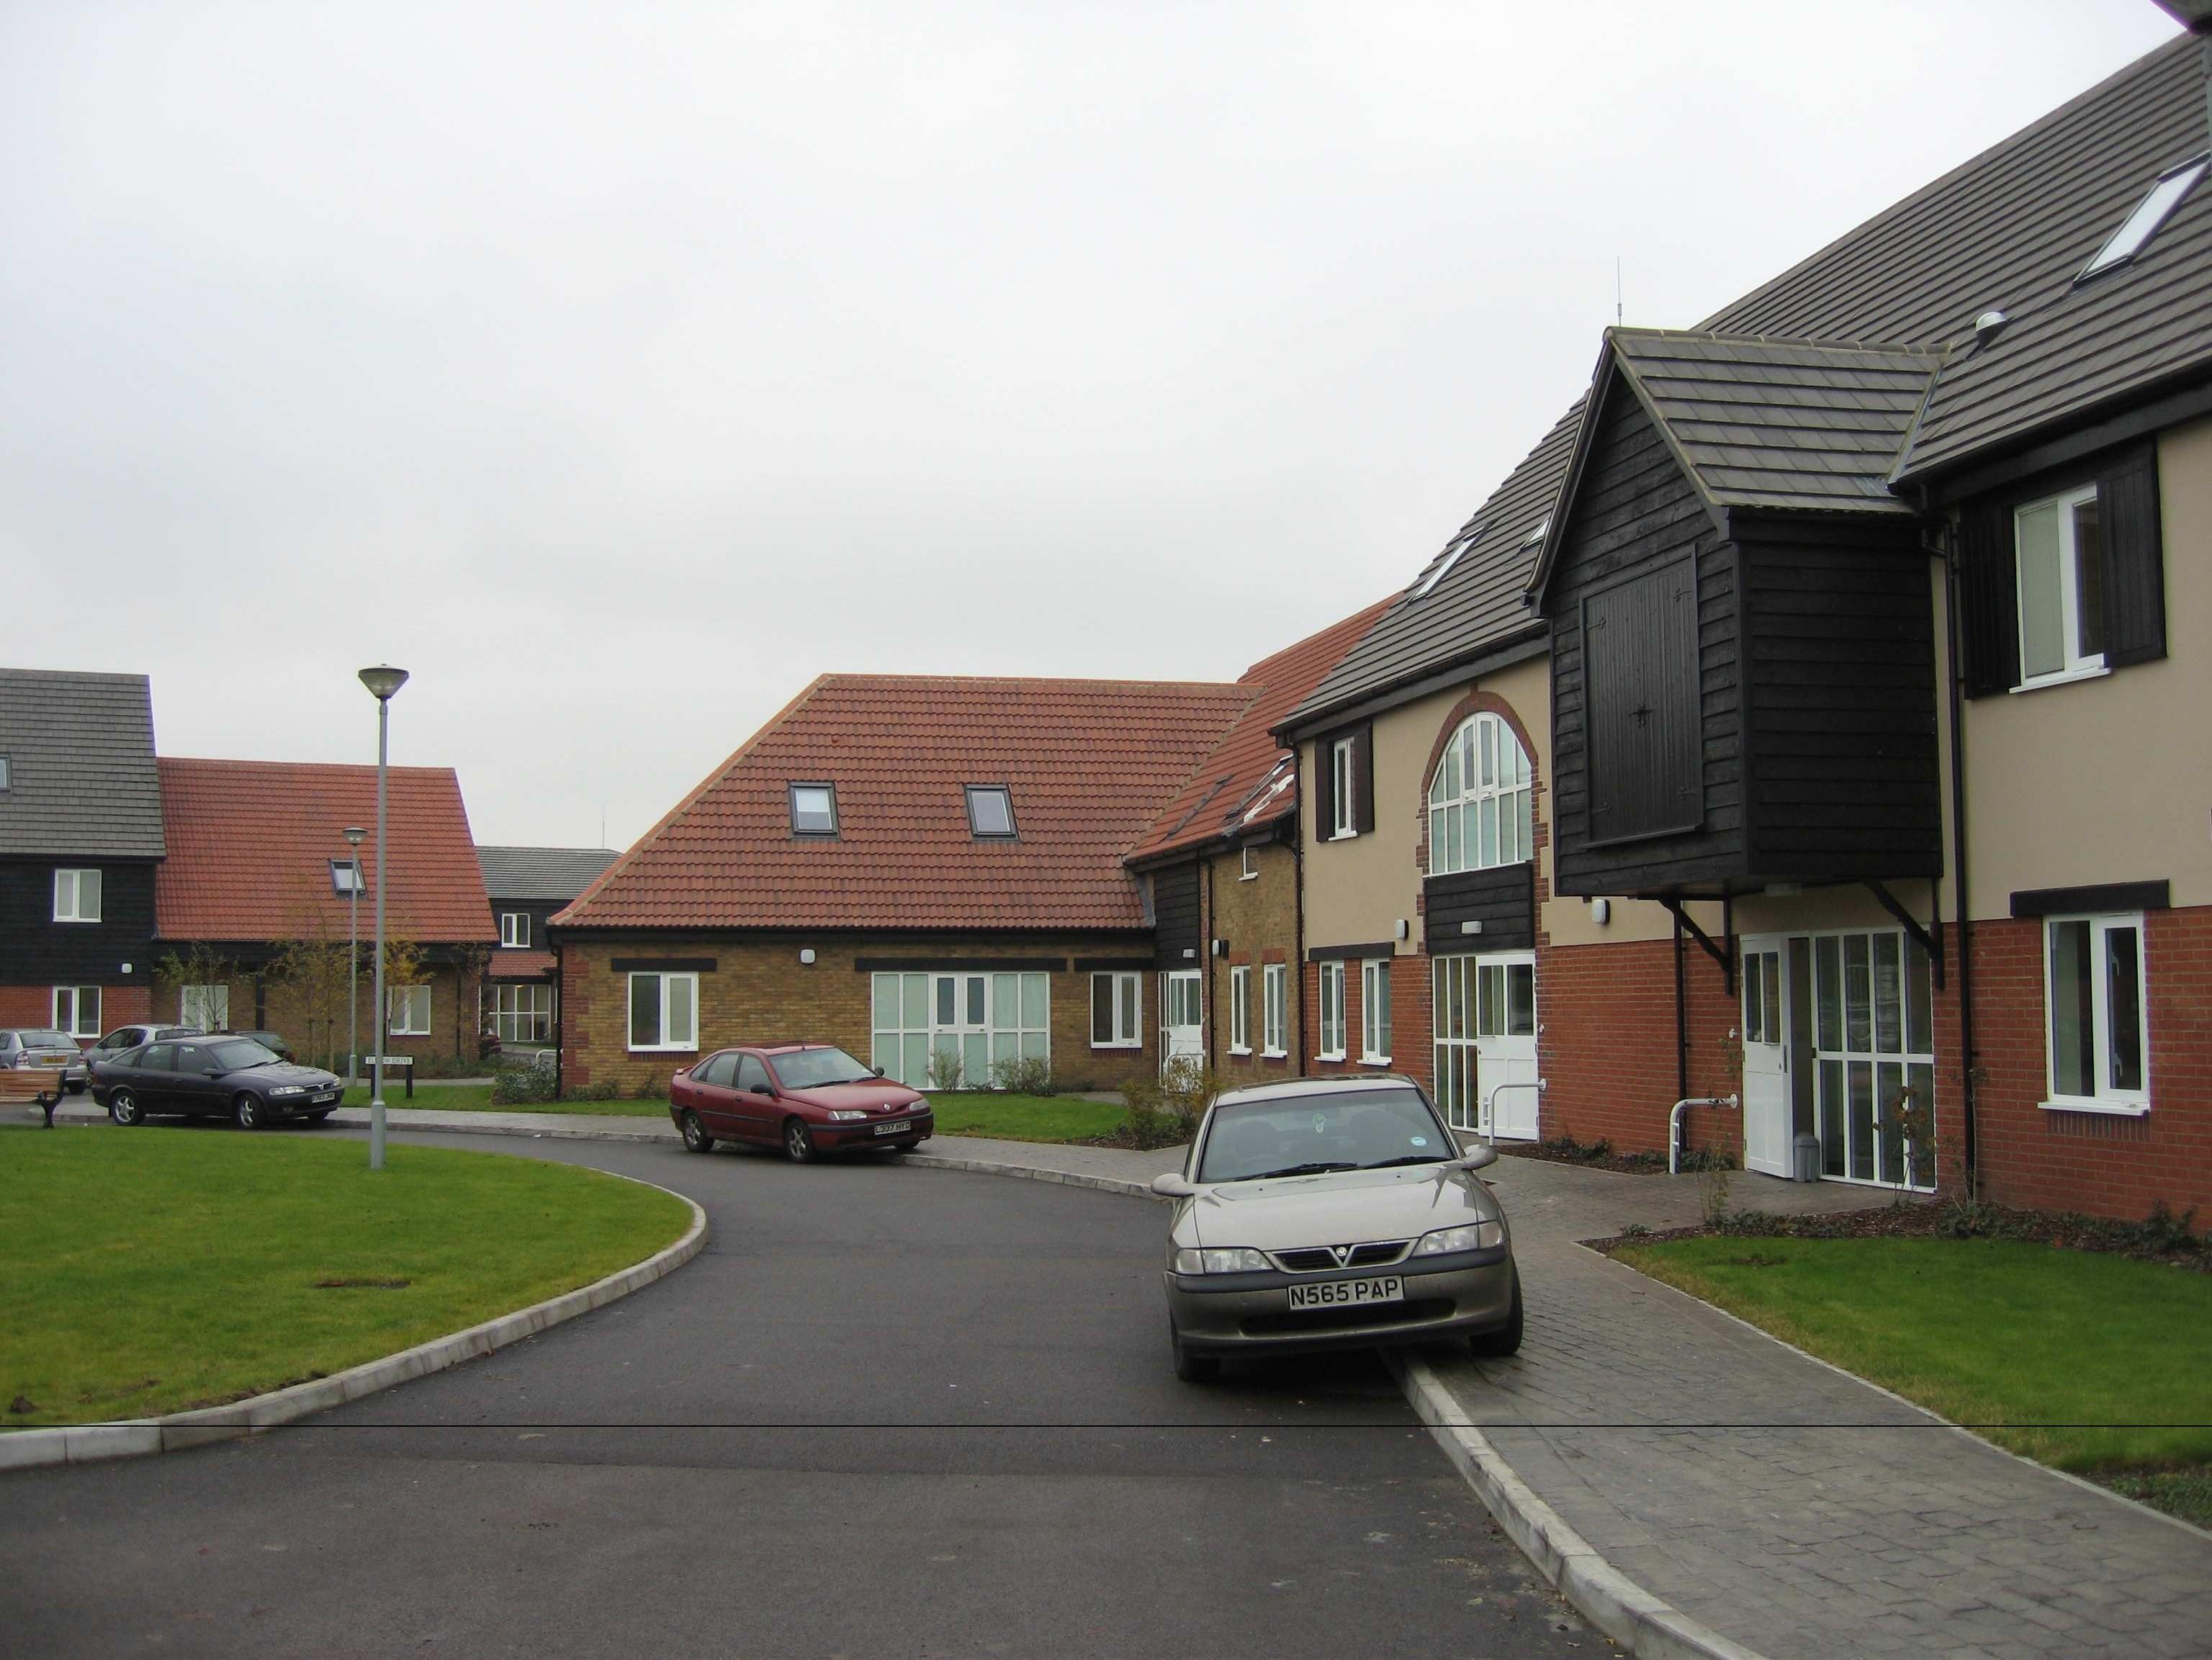 Milton Park Hospital, Wyboston, Bedfordshire